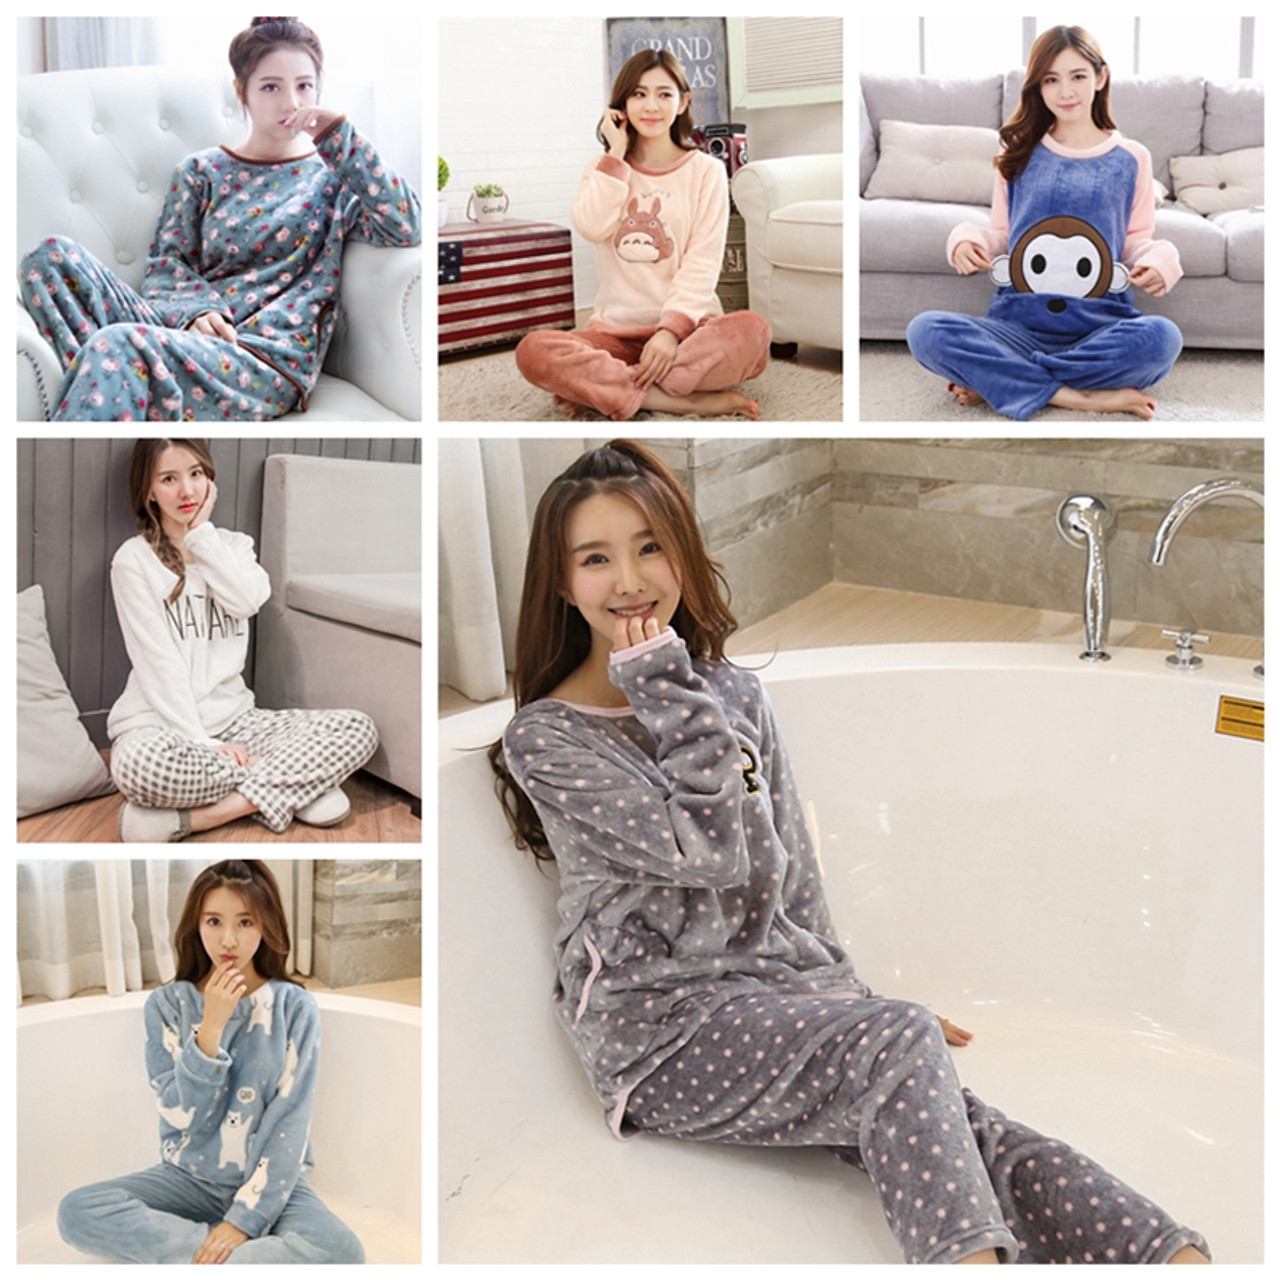 910d7cf153 ... Thick Warm Flannel Pajamas Sets Winter Women Two Piece Pajama Set  Cartoon Female Sleepwear Home Clothing